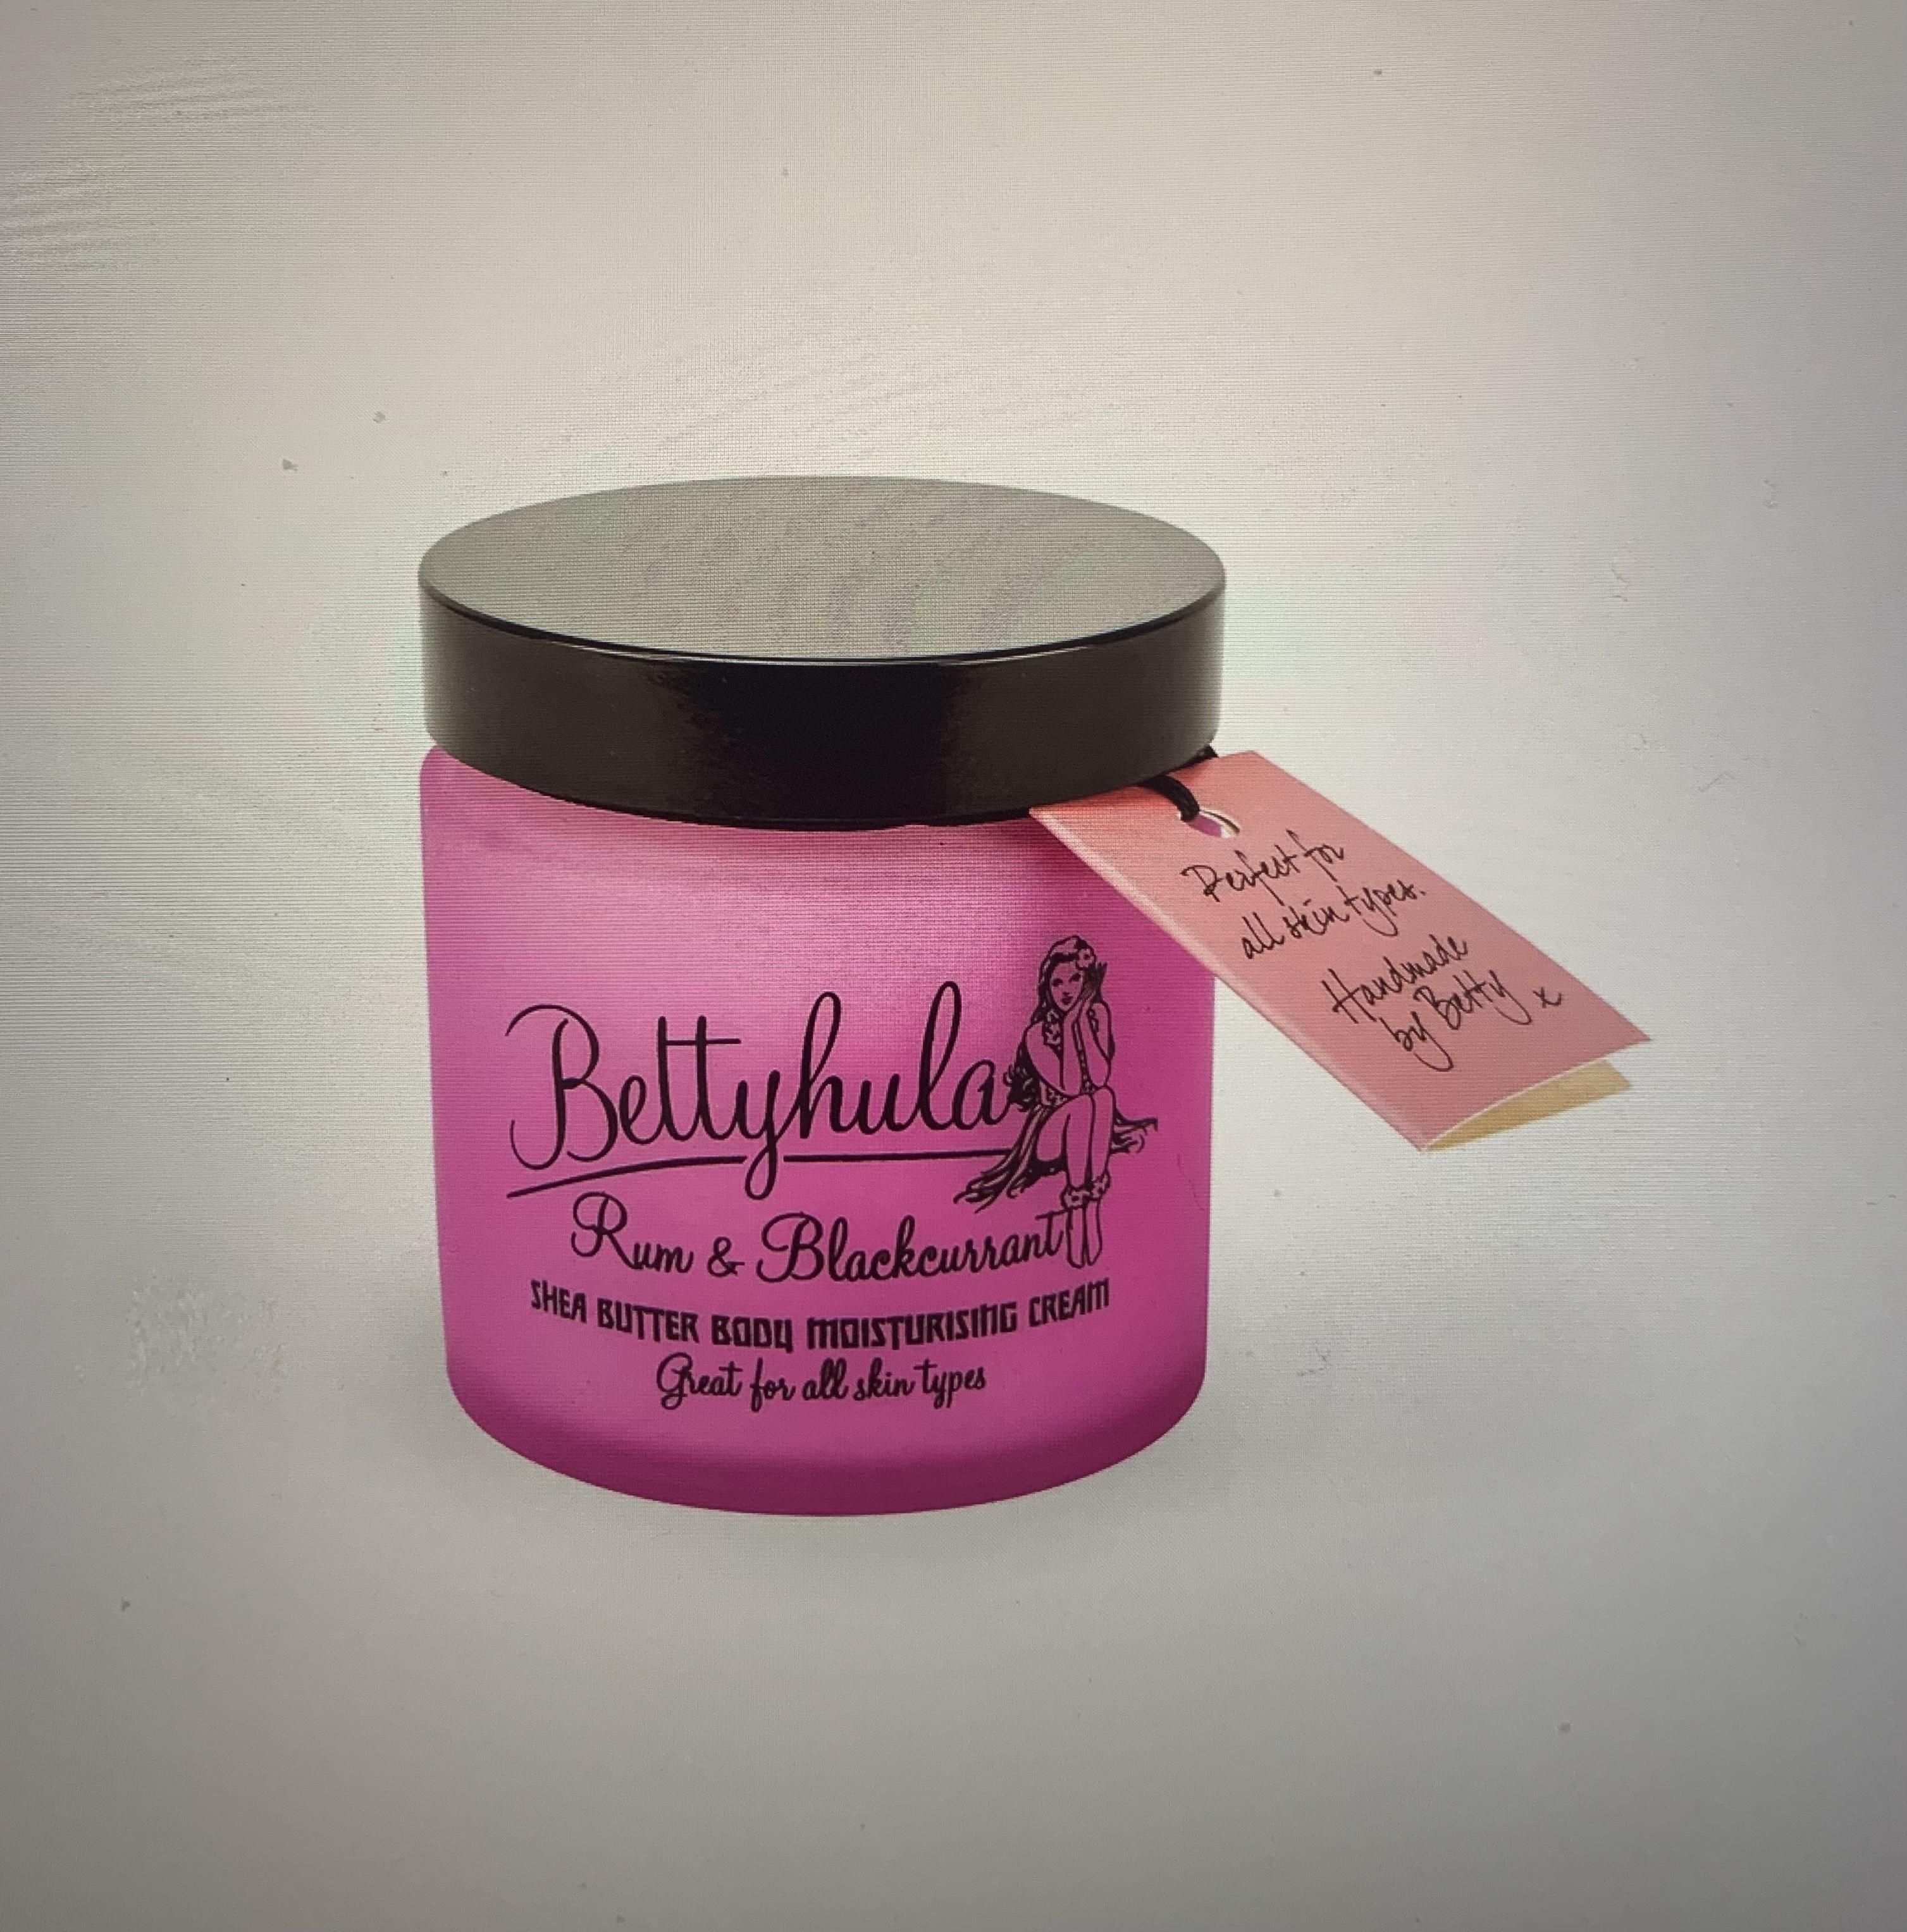 Betty Hula Shea Butter Body Moisturiser - Rum & Blackcurrant